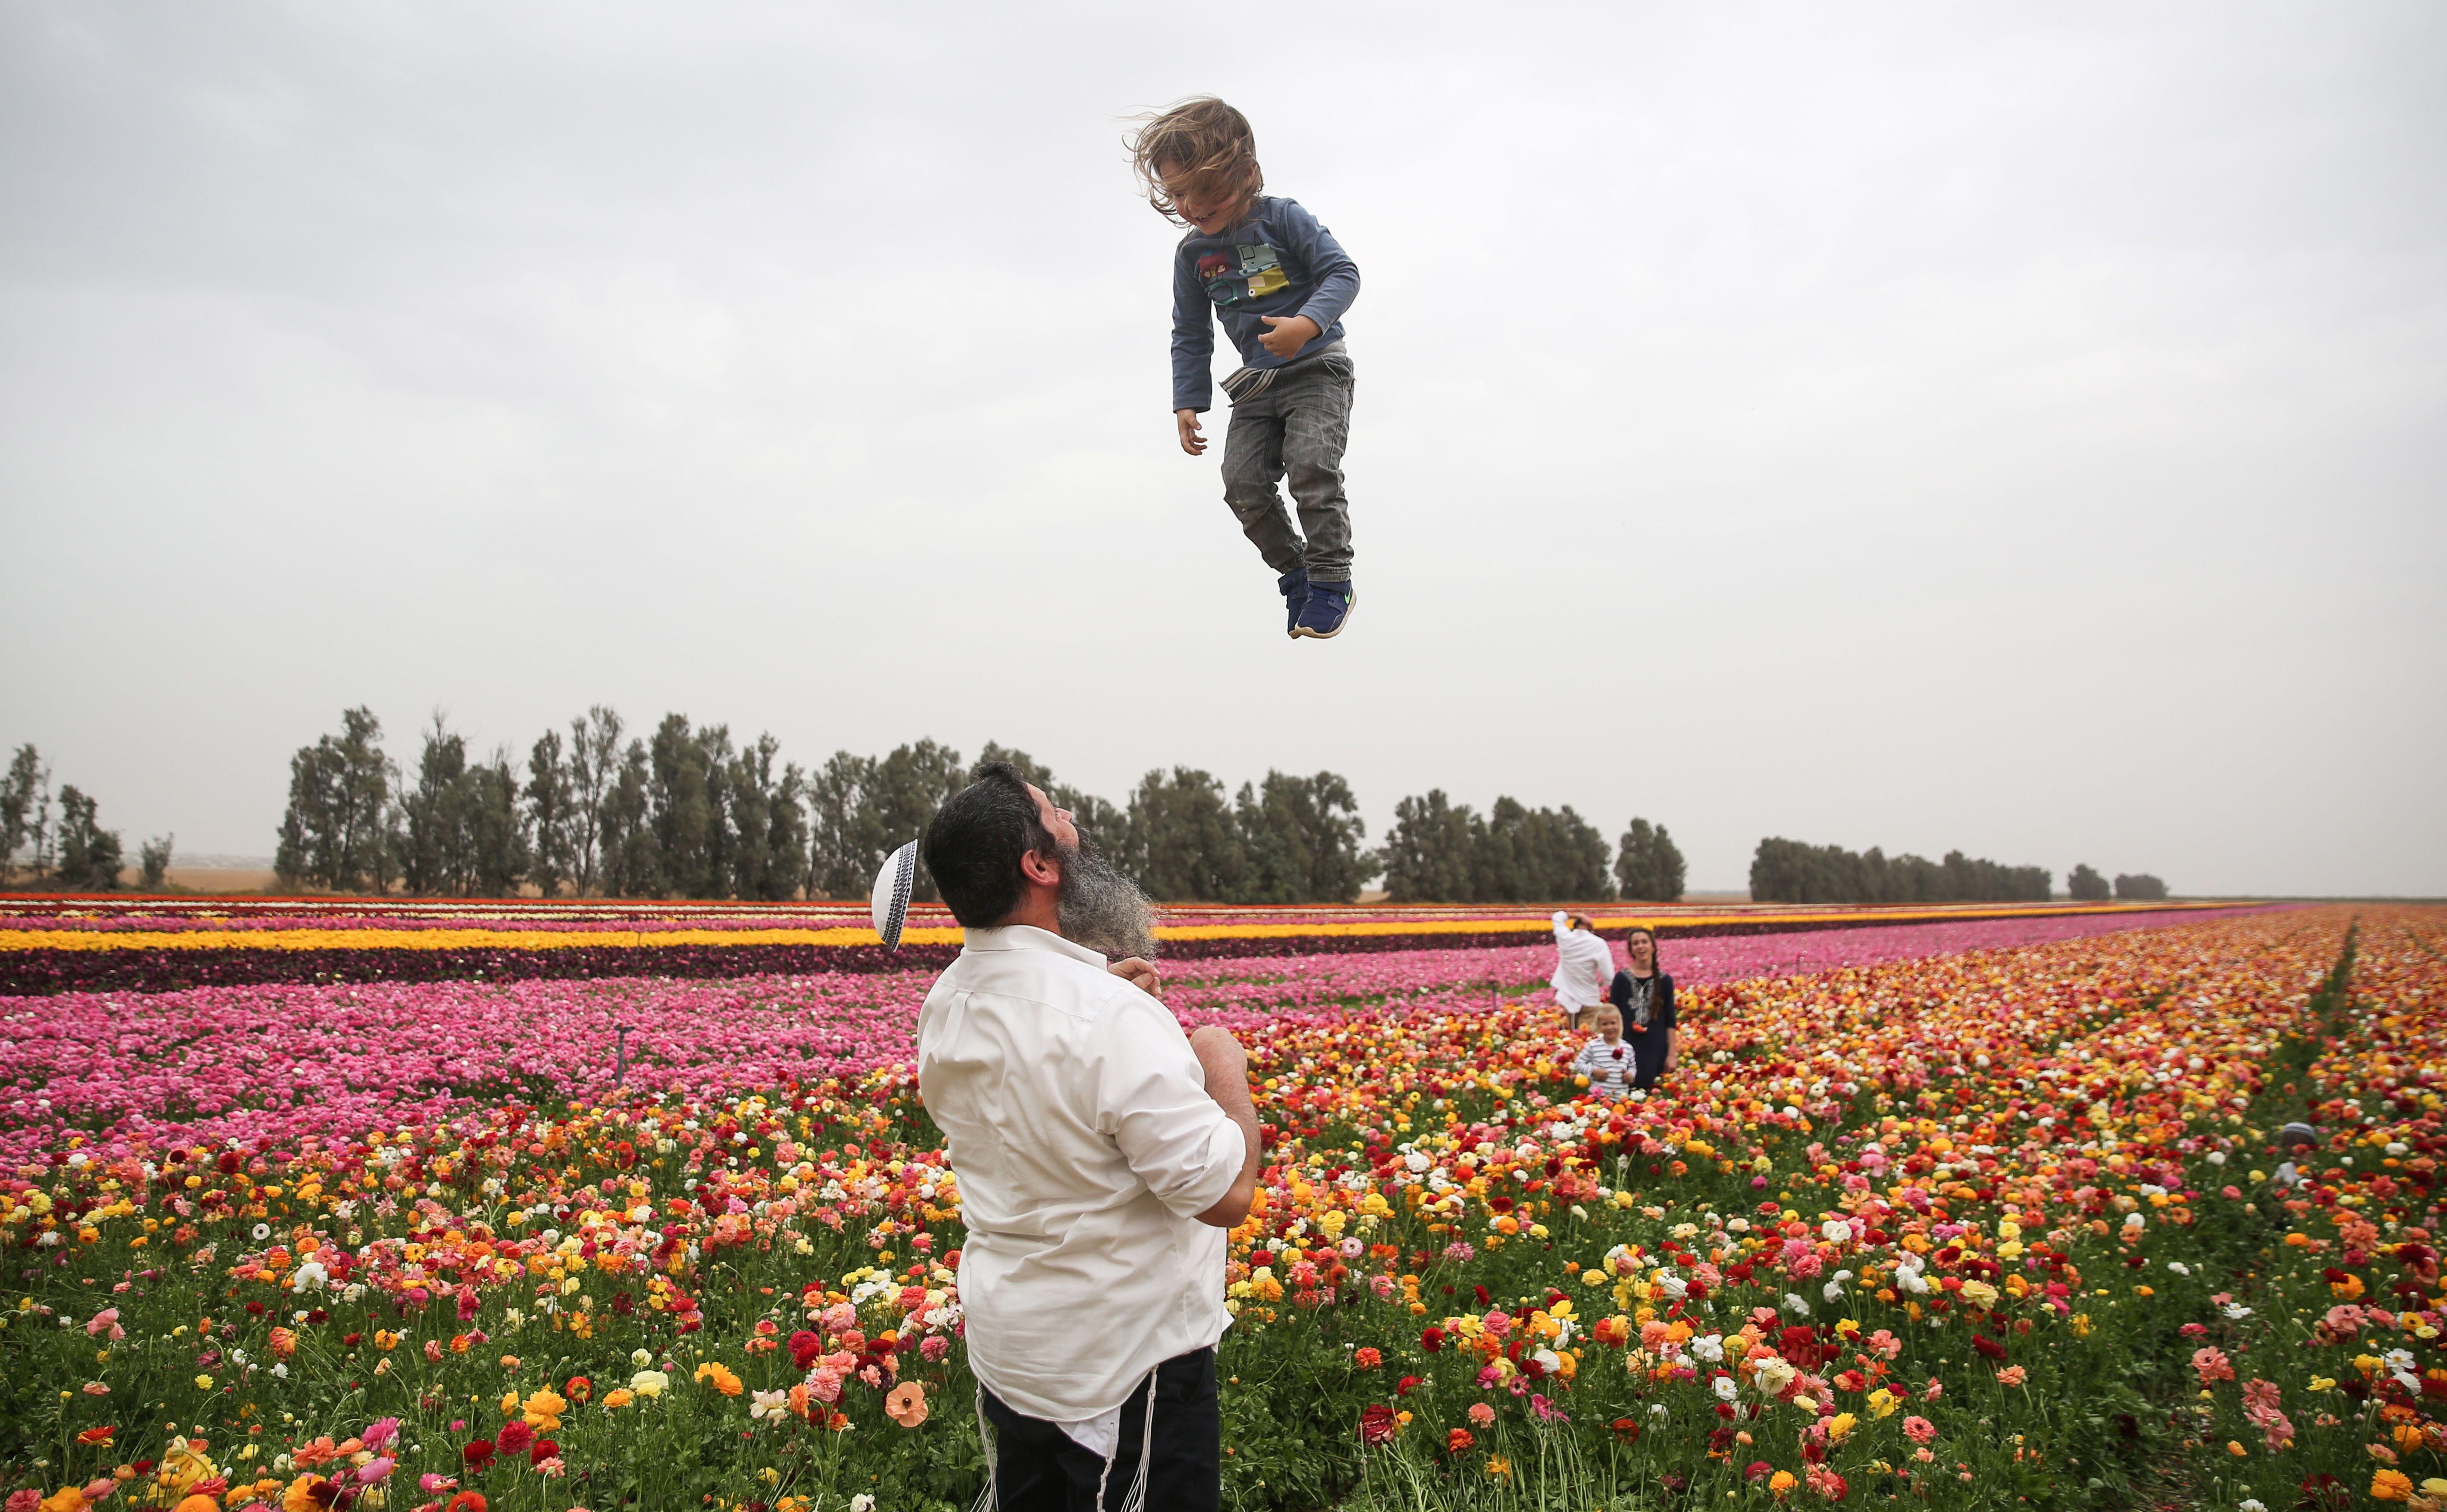 An Israeli man playfully throws a child as his kippah falls off in a field of ranunculus flowers in the southern Israeli Kibbutz of Nir Yitzhak, located along the Israeli-Gaza Strip border on April 12, 2017.